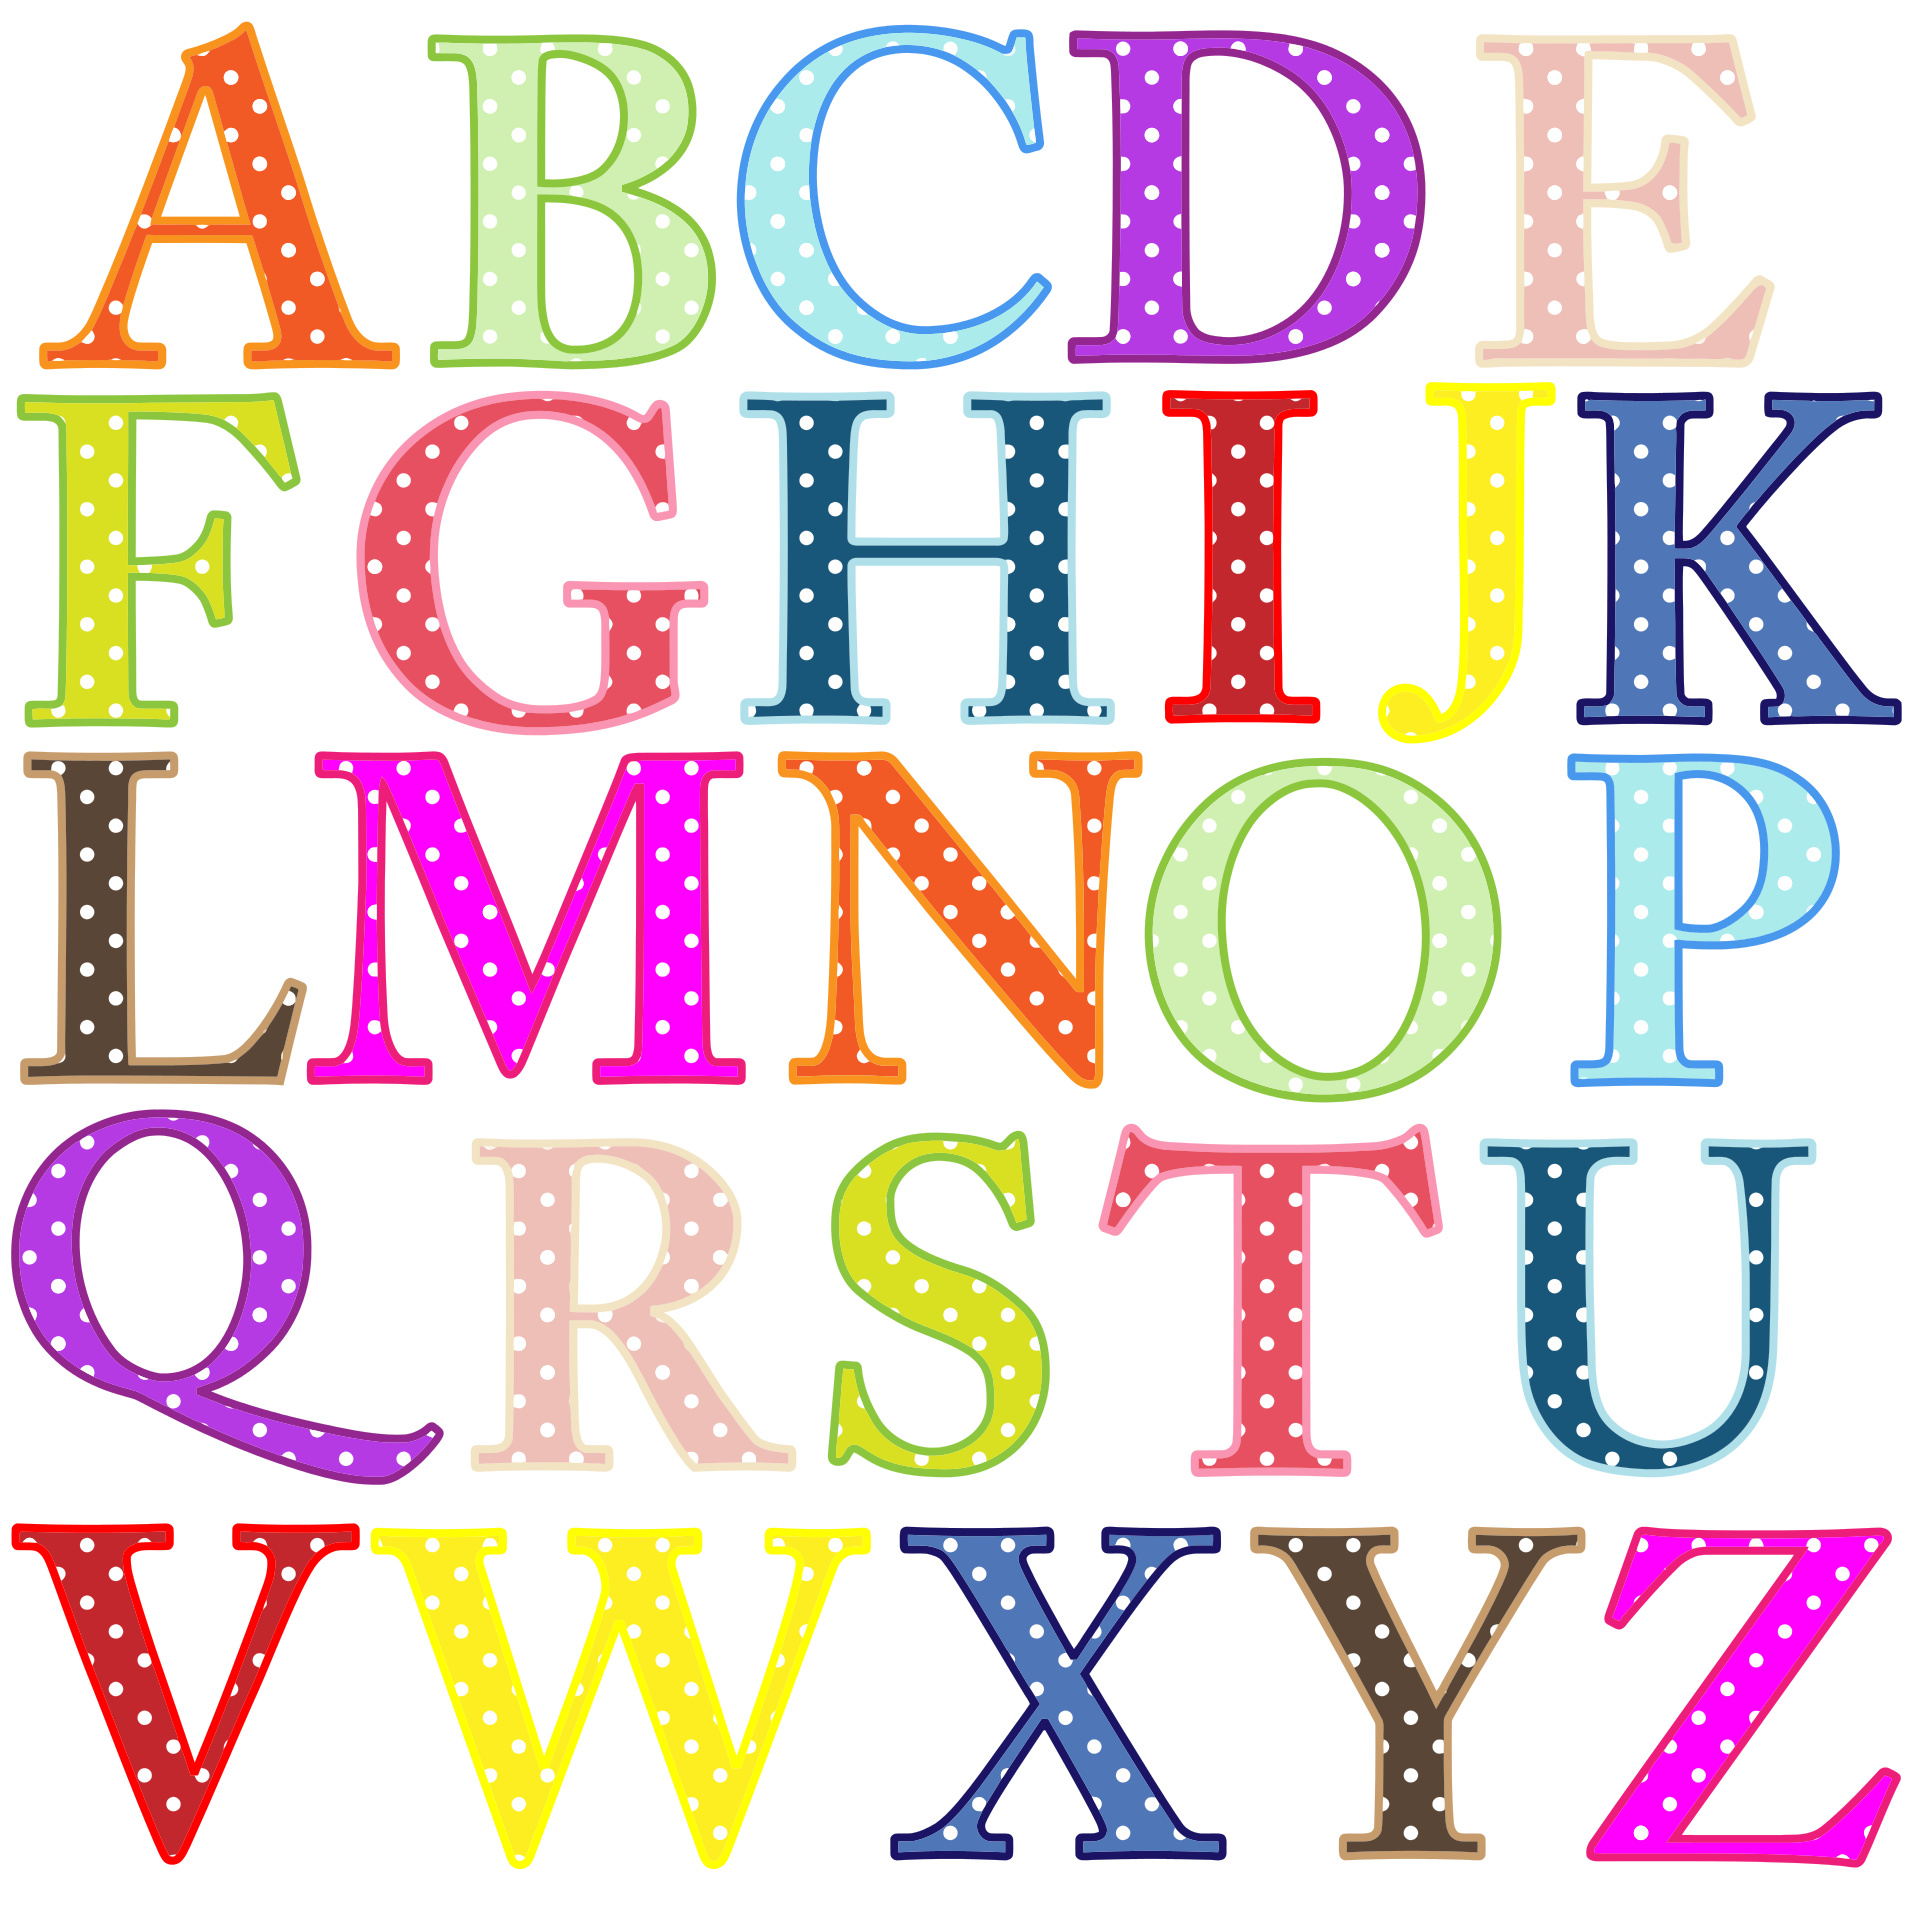 Polkadot letter s clipart library Polka Dot Numbers Clipart - Clipart Kid library